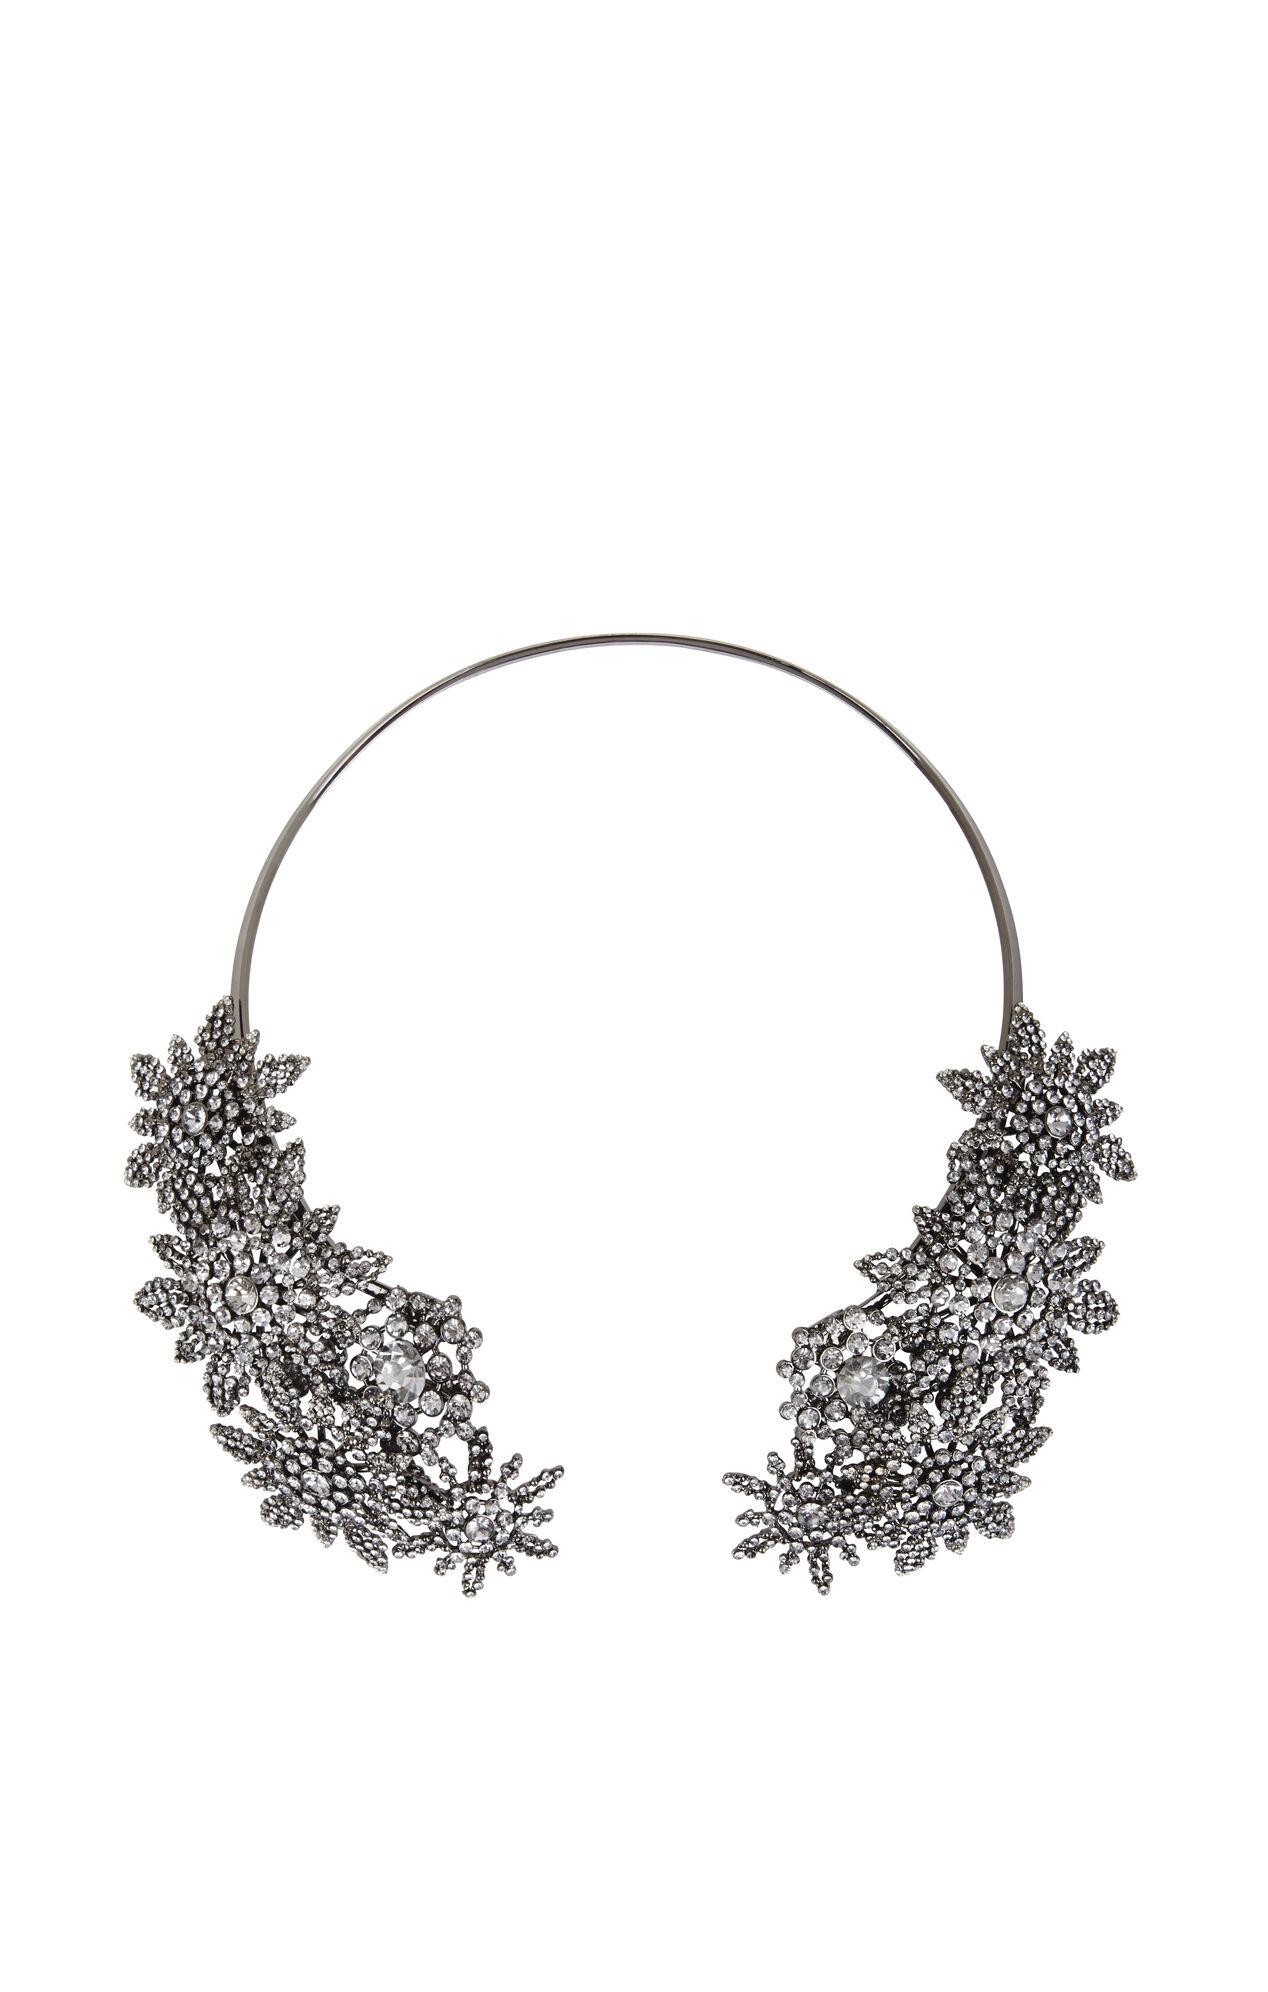 Floral Cluster Collar